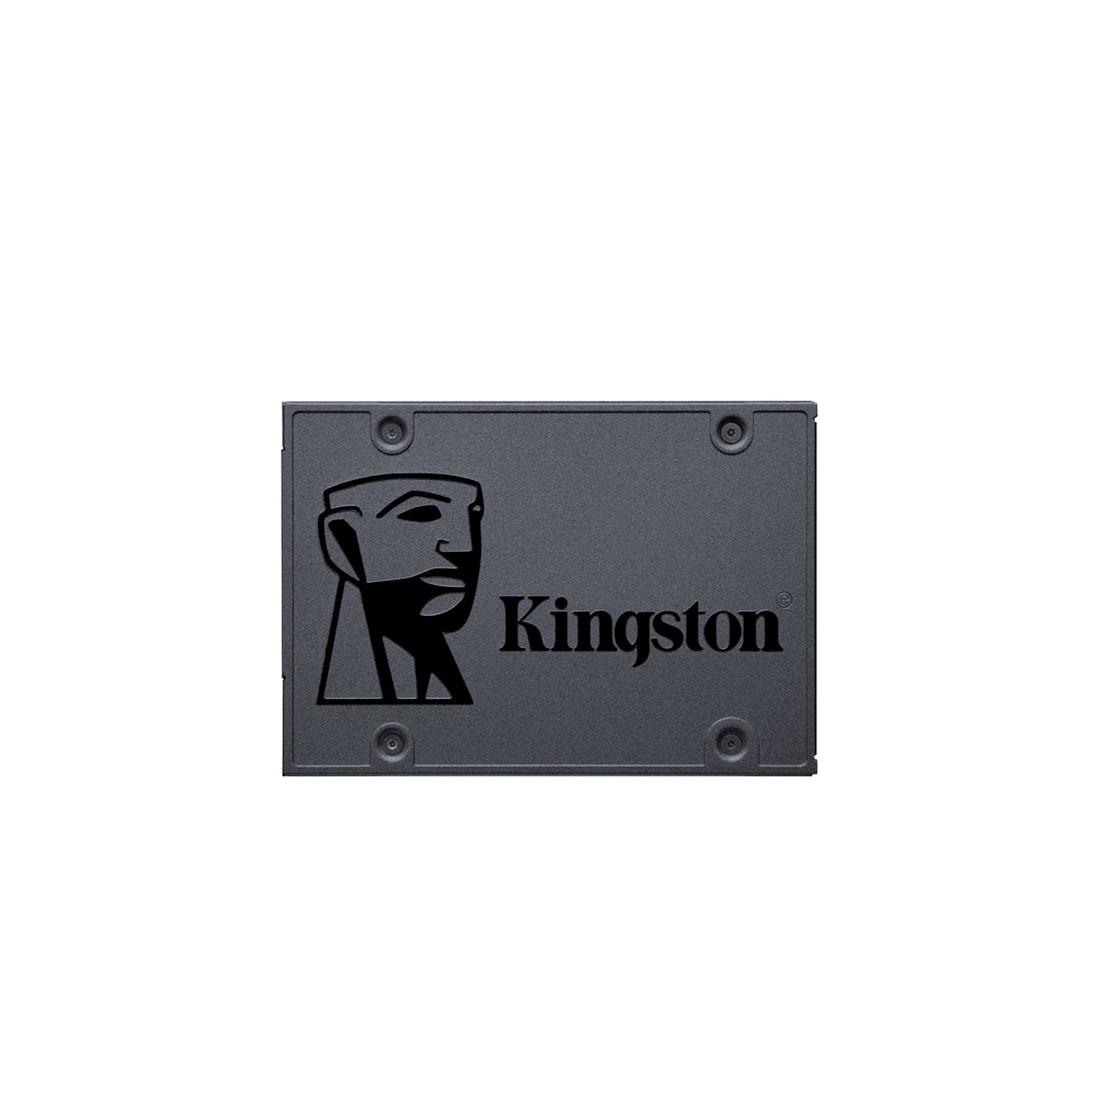 Kingston SA400S37/240G SATA 7мм Твердотельный накопитель SSD